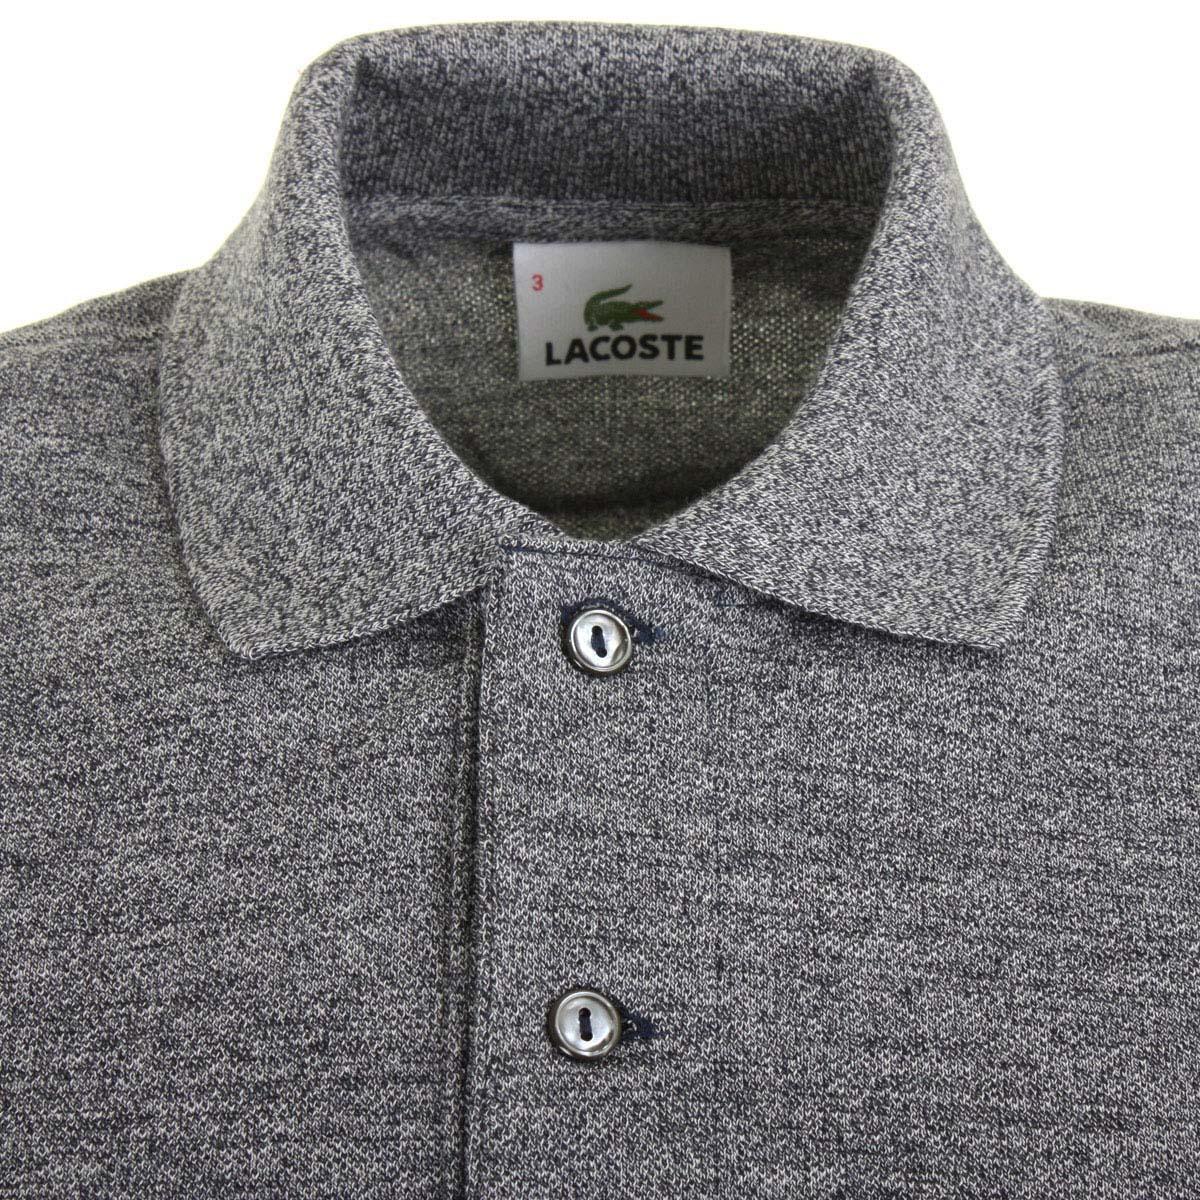 013bcba9fadcd3 Lacoste Mens L1313 Marl Long Sleeve L12.12 Polo Shirt 27% OFF RRP